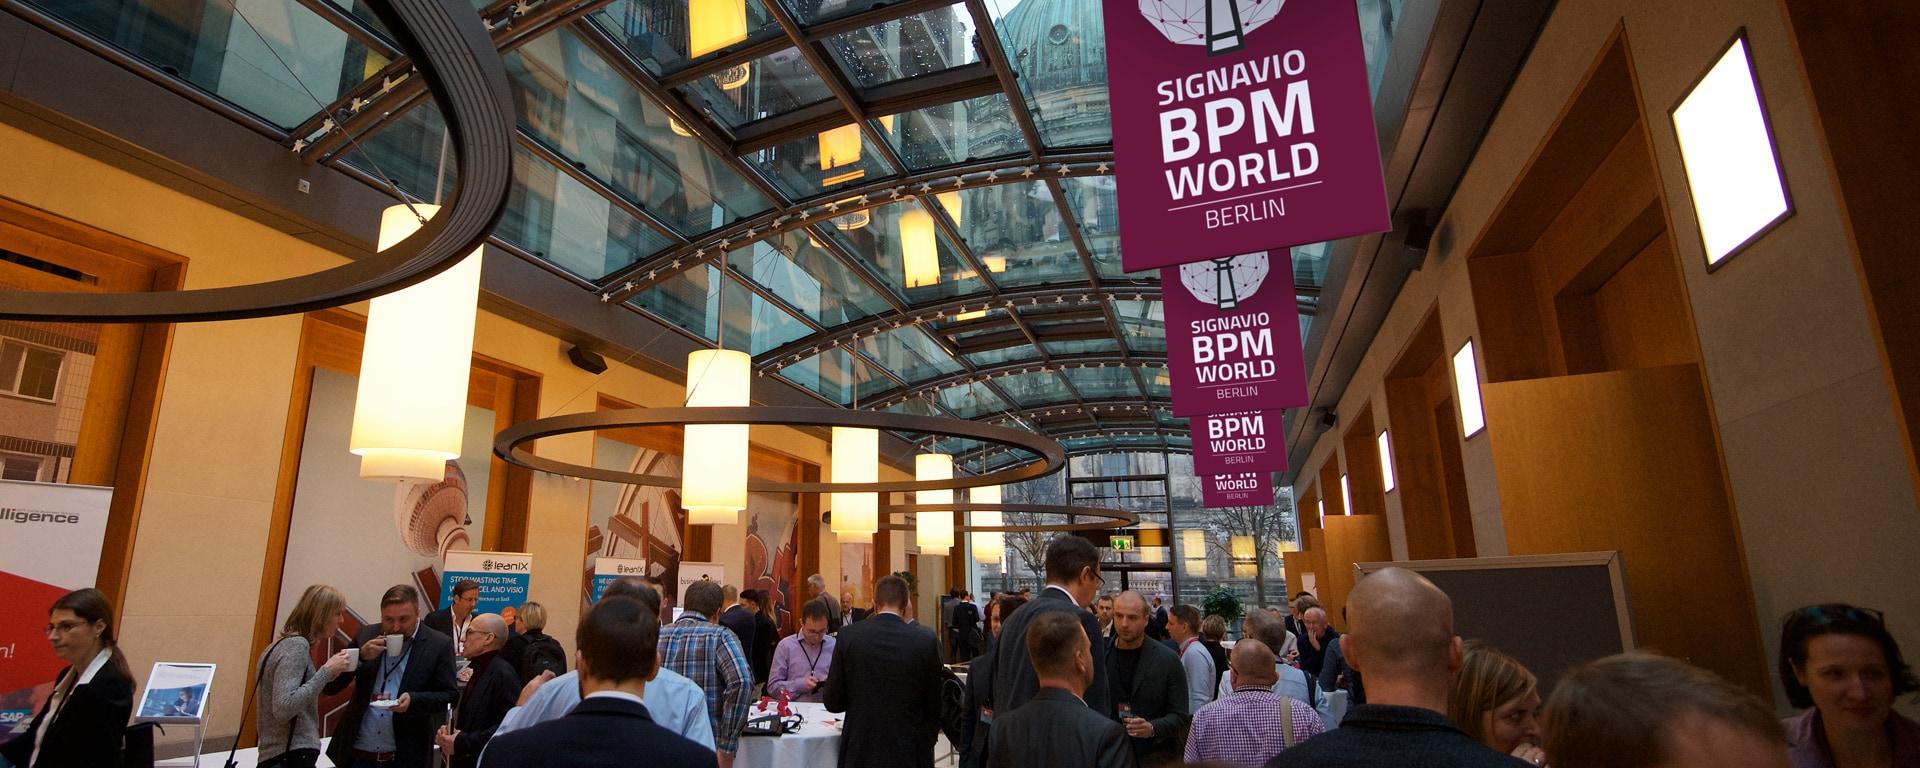 Signavio in 2018 - BPM World